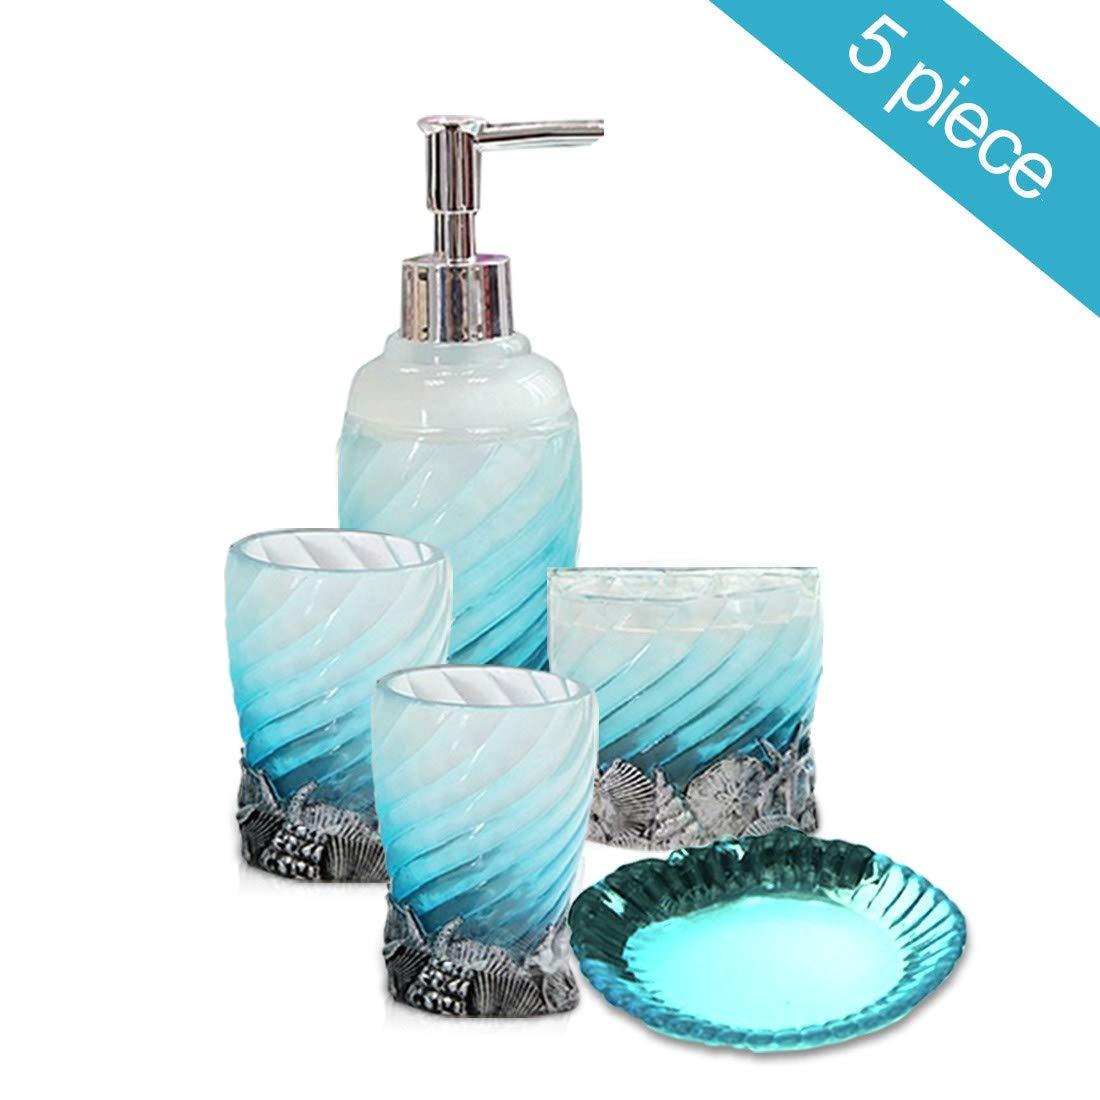 HotSan bathroom accessory Set, 5 PCS Bath Ensemble Set Includes Soap Dispenser, Soap Dish, Tumble, Toothbrush Holder - Light Blue Polyresin Glass for Home, Office, Superior Hotel